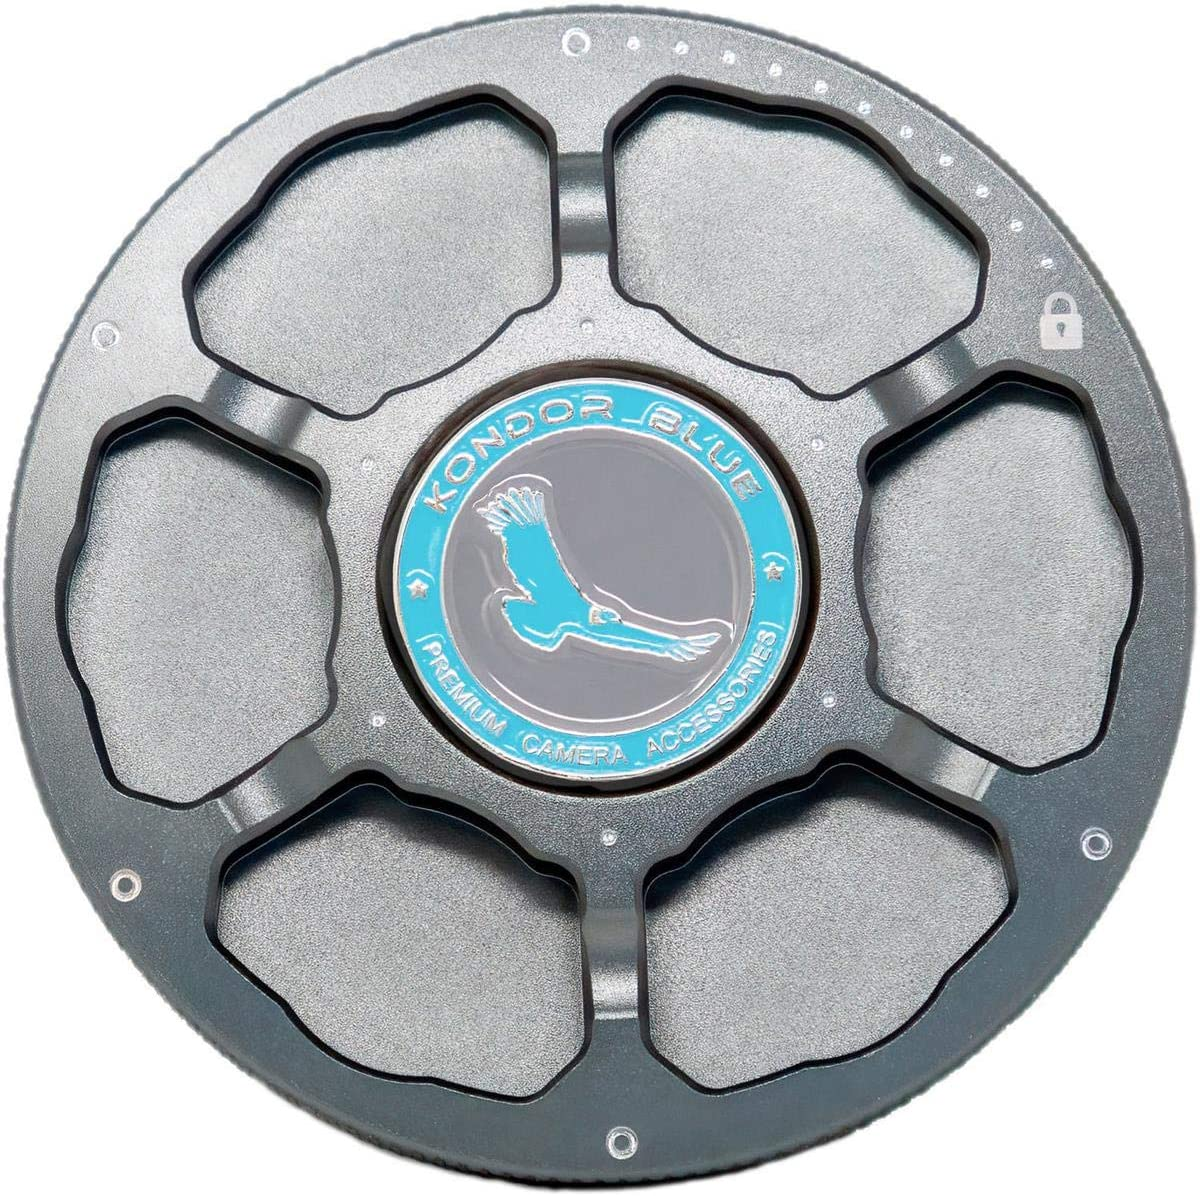 Space Gray Aluminum Alloy EOS DSLR Cine Camera Port Cover KONDOR BLUE EF Mount Camera Body Cap Metal